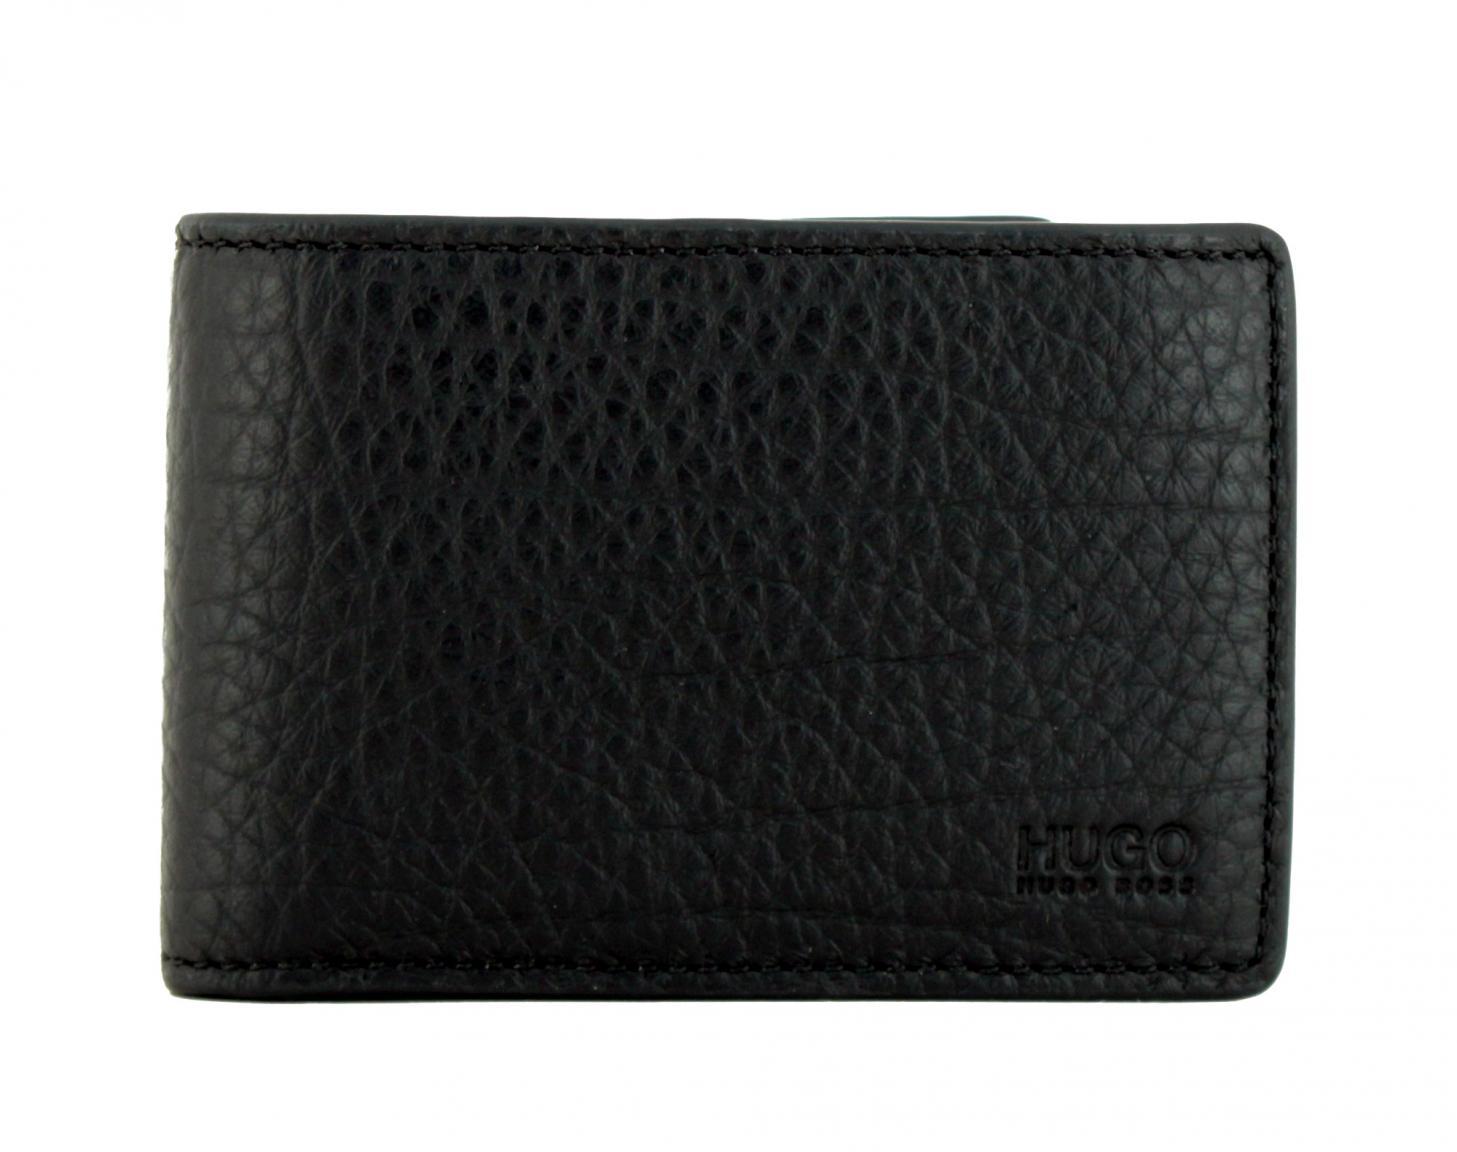 Hugo Boss Victorian flap Klappportemonnaie schwarz Leder